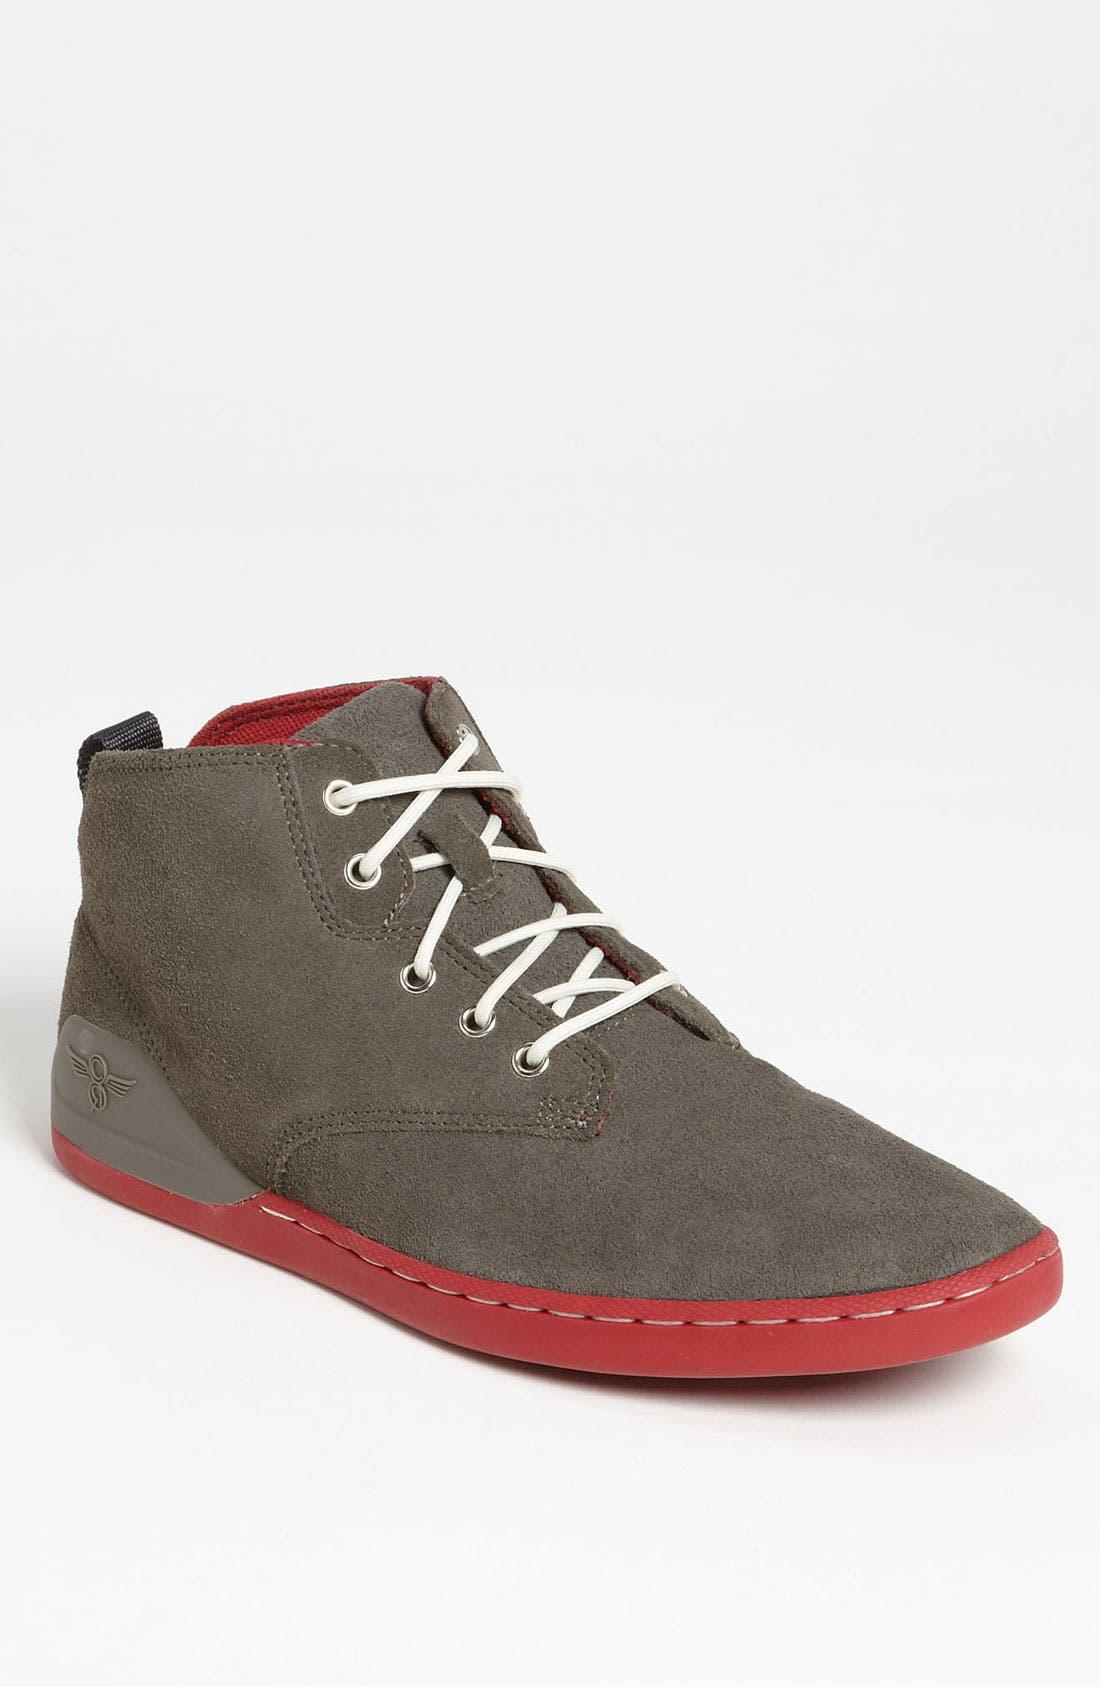 Alternate Image 1 Selected - Creative Recreation 'Vito' Sneaker (Men)